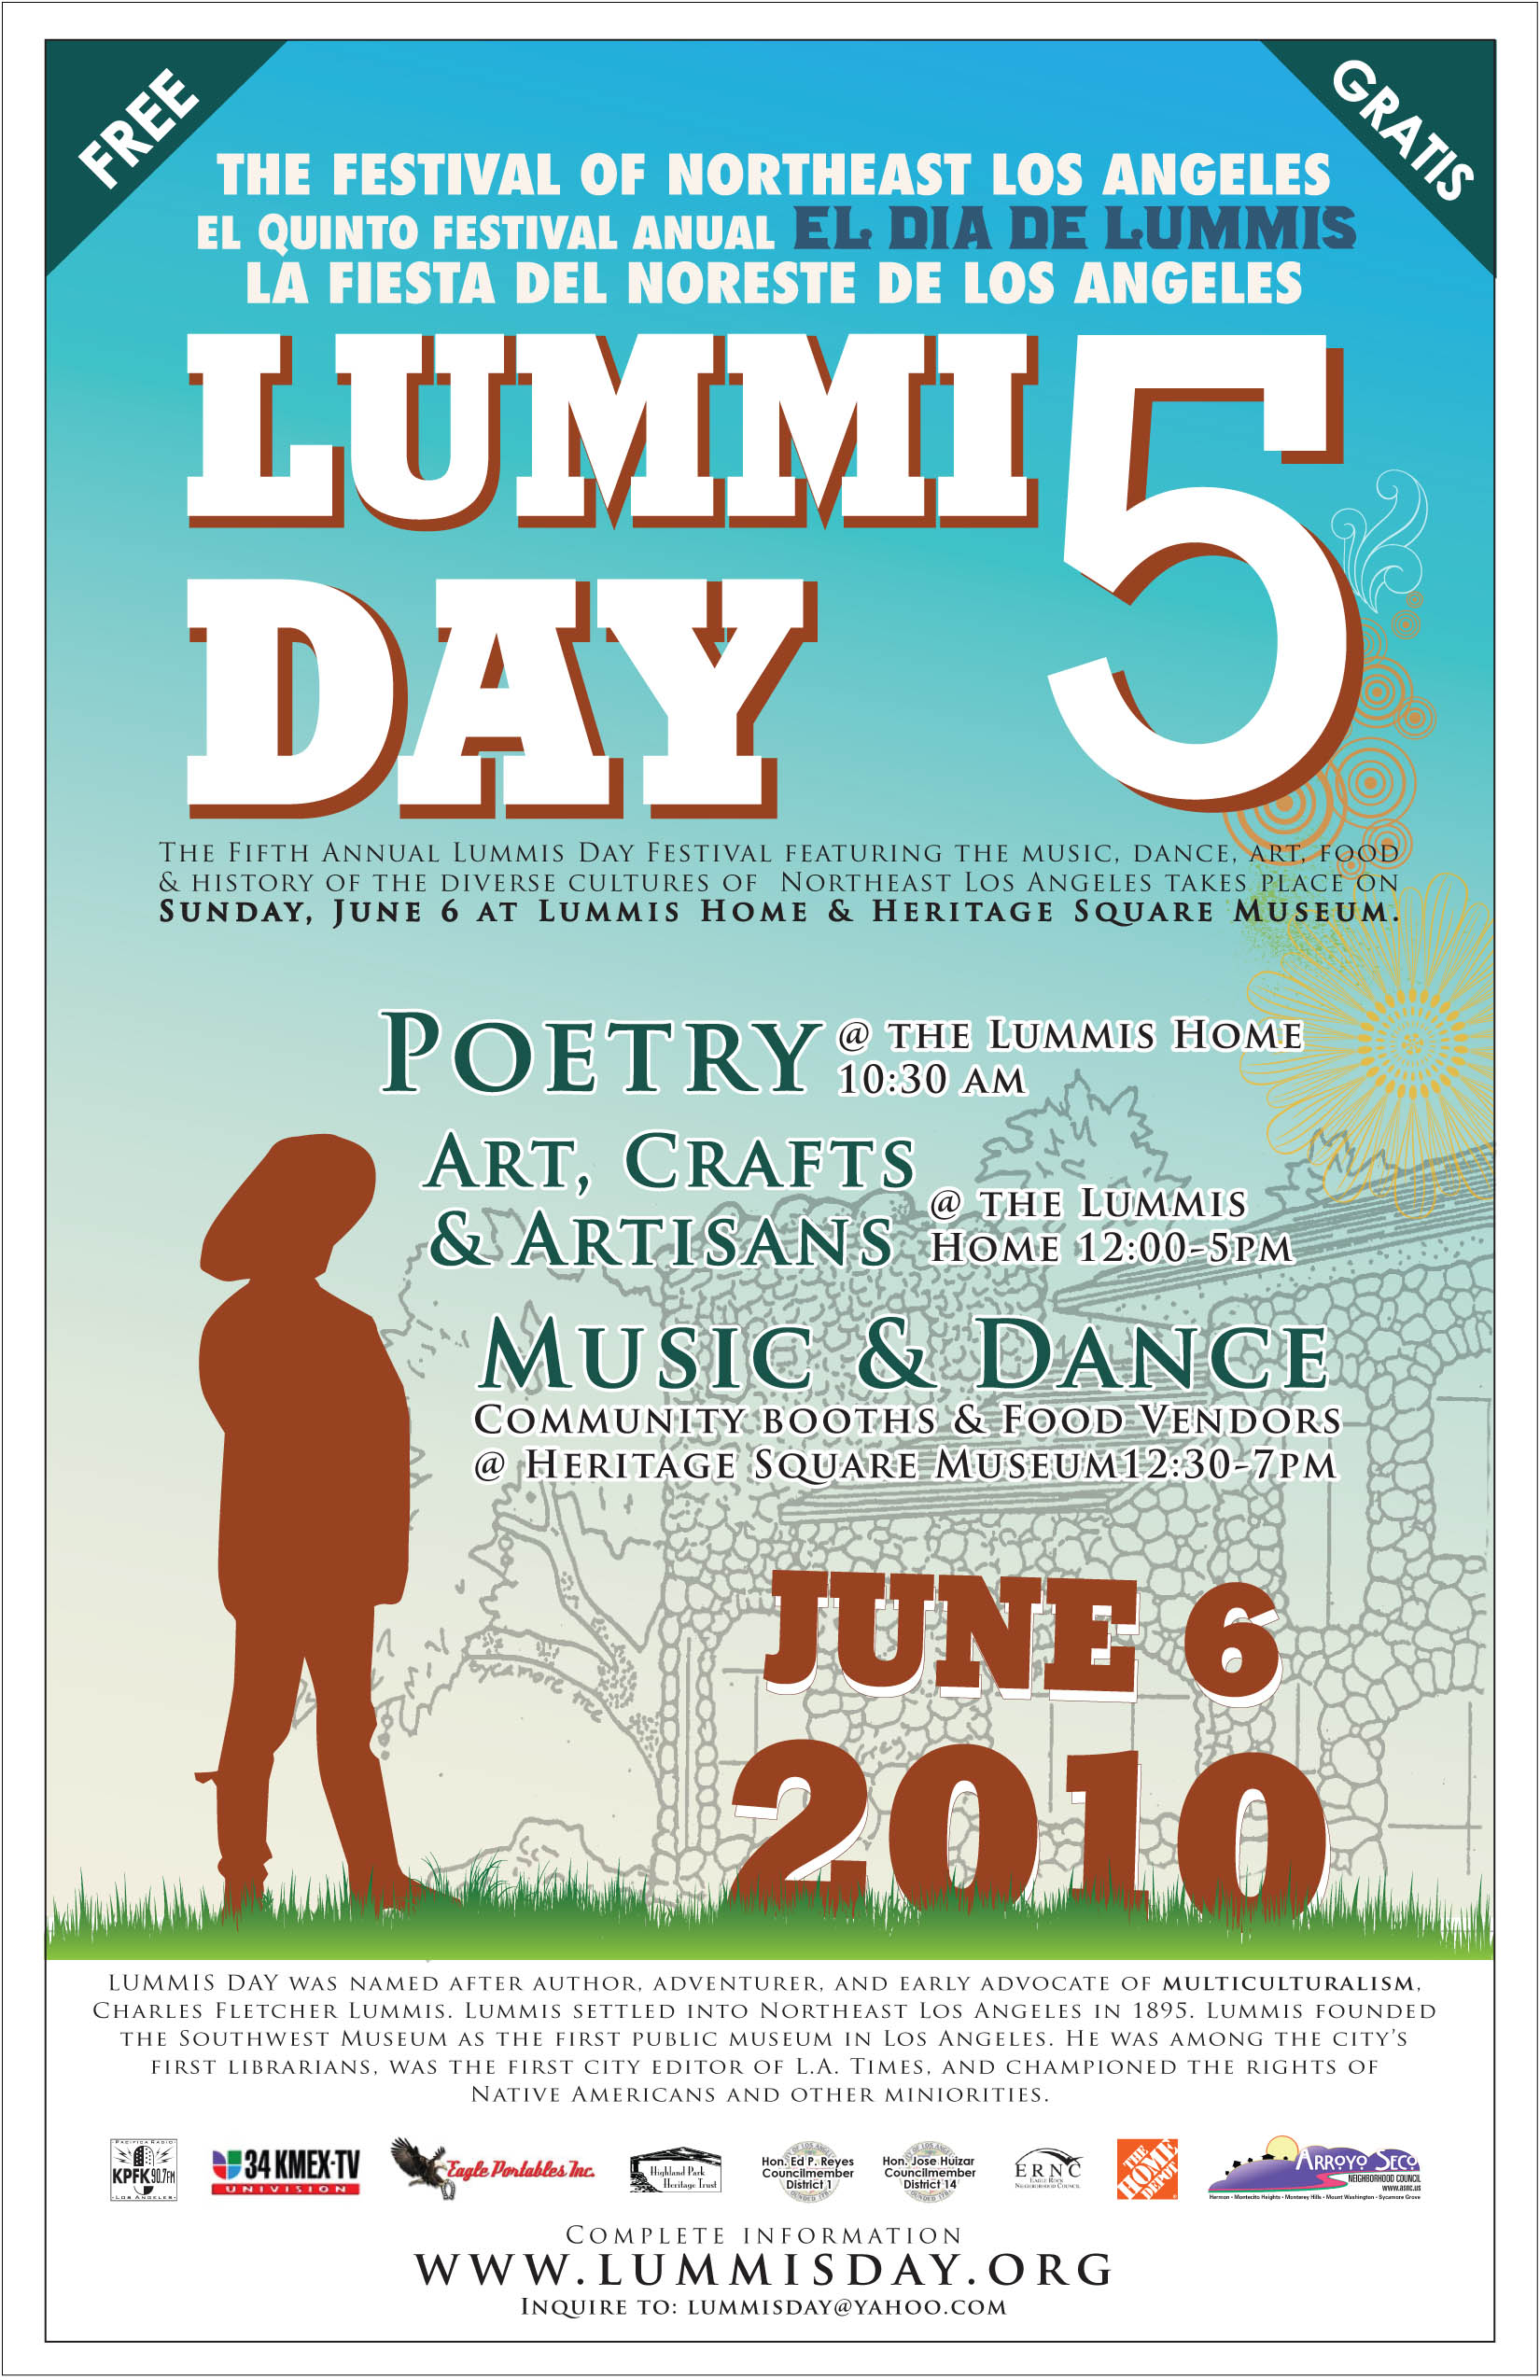 2010 Lummis Day Festival